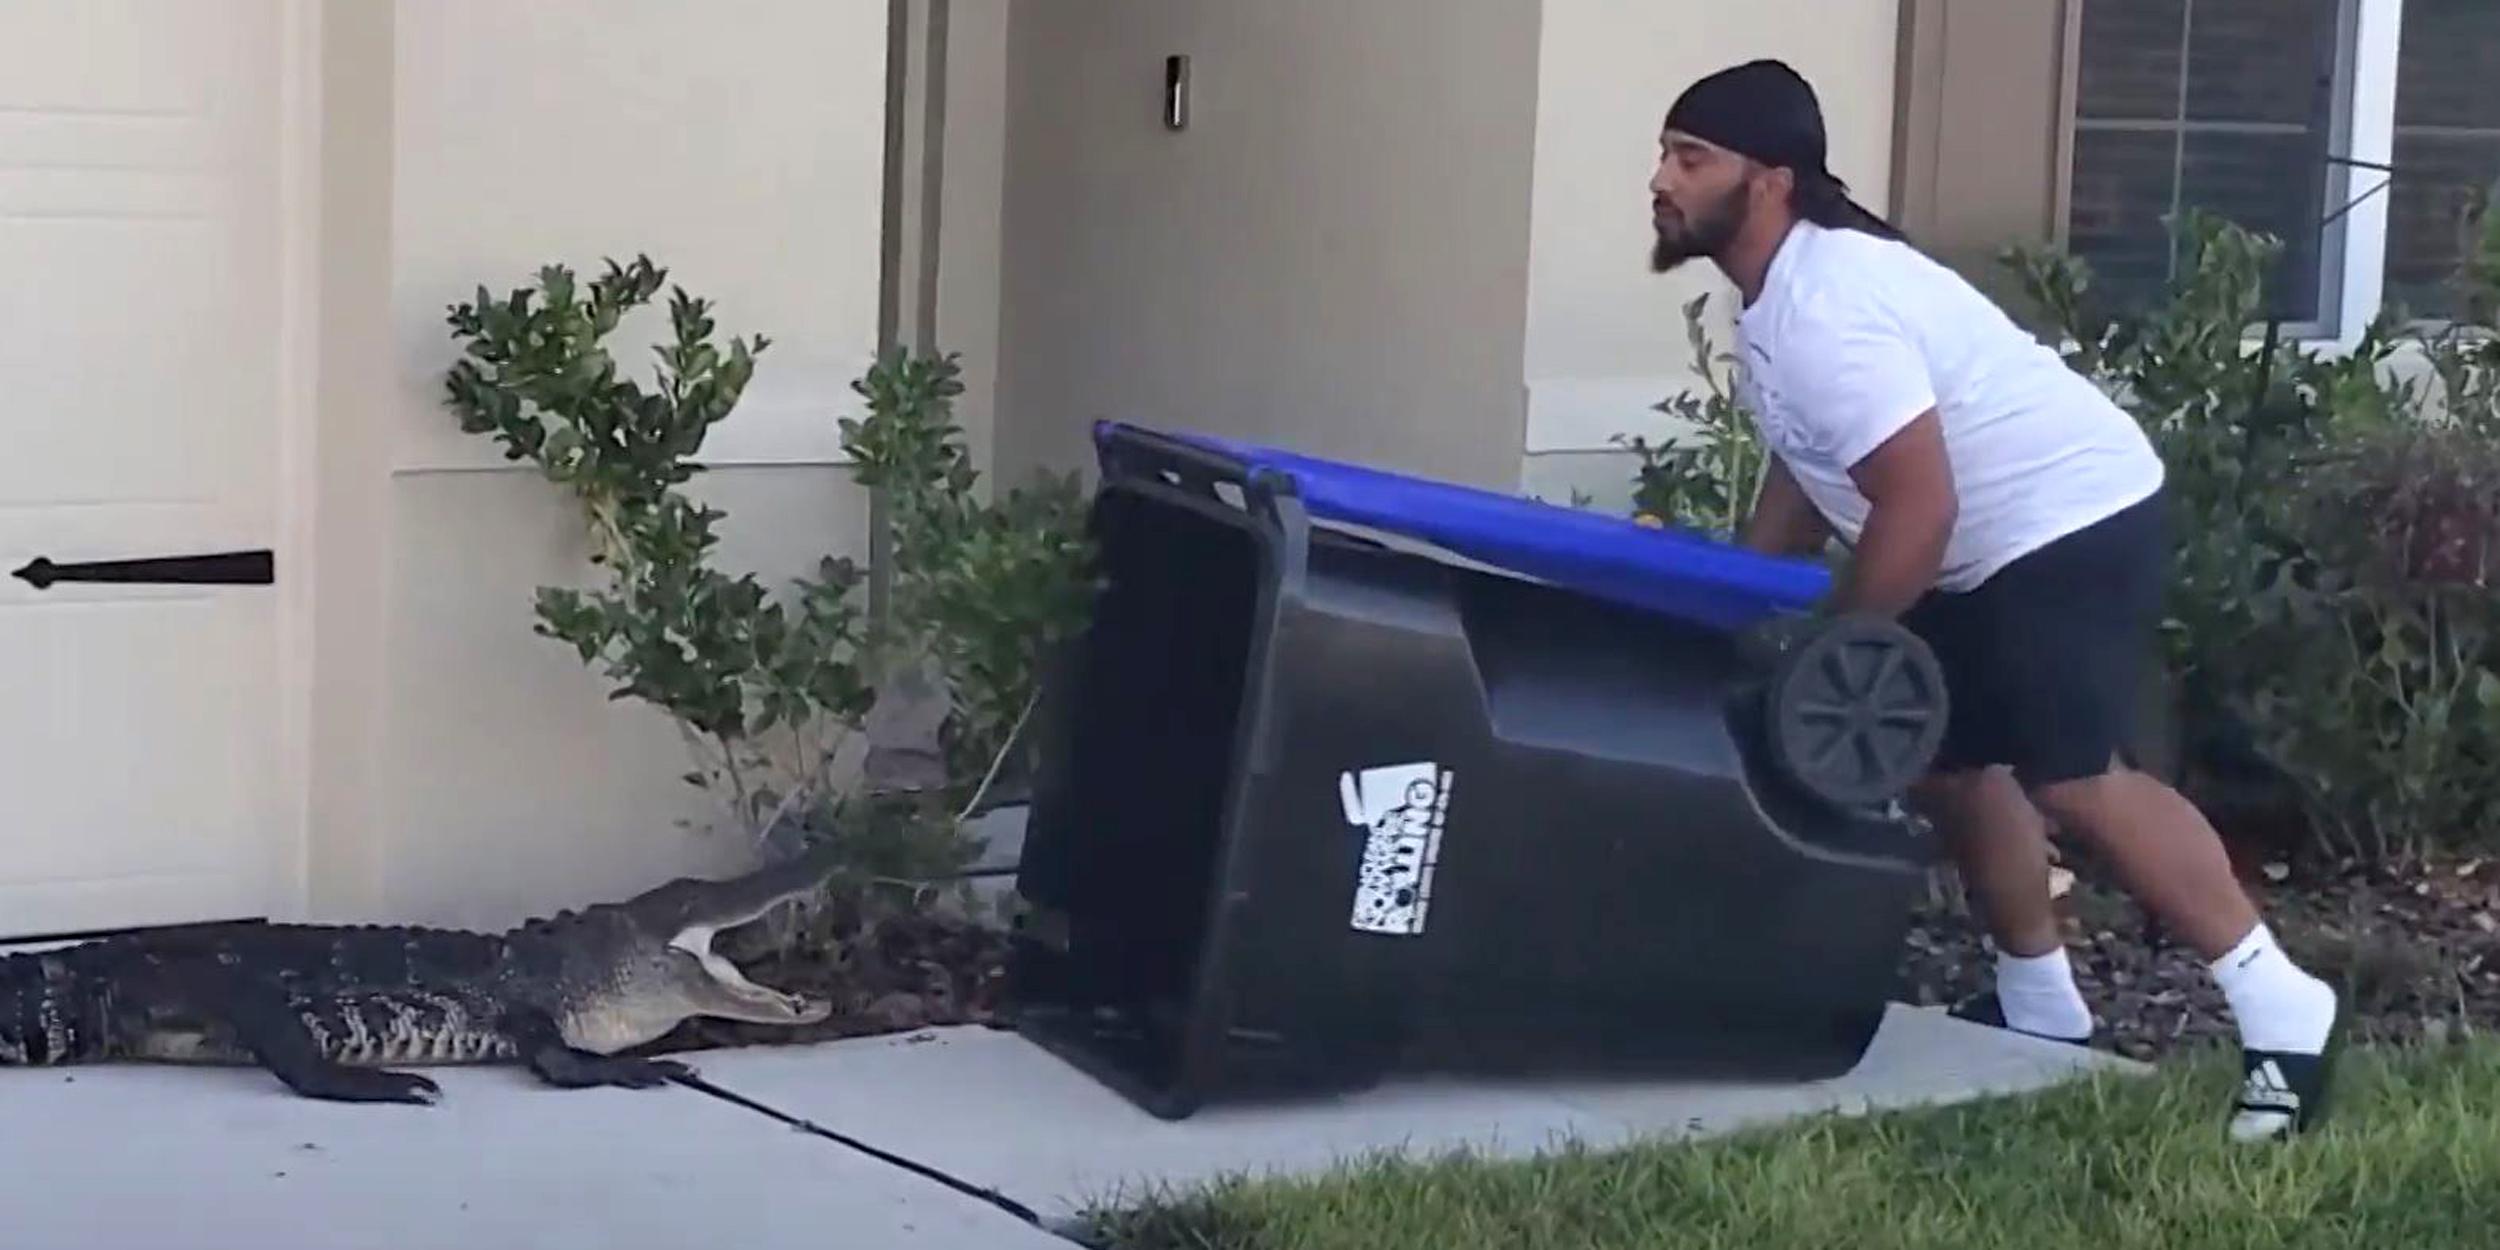 Wild video shows Florida man trapping alligator in a garbage bin